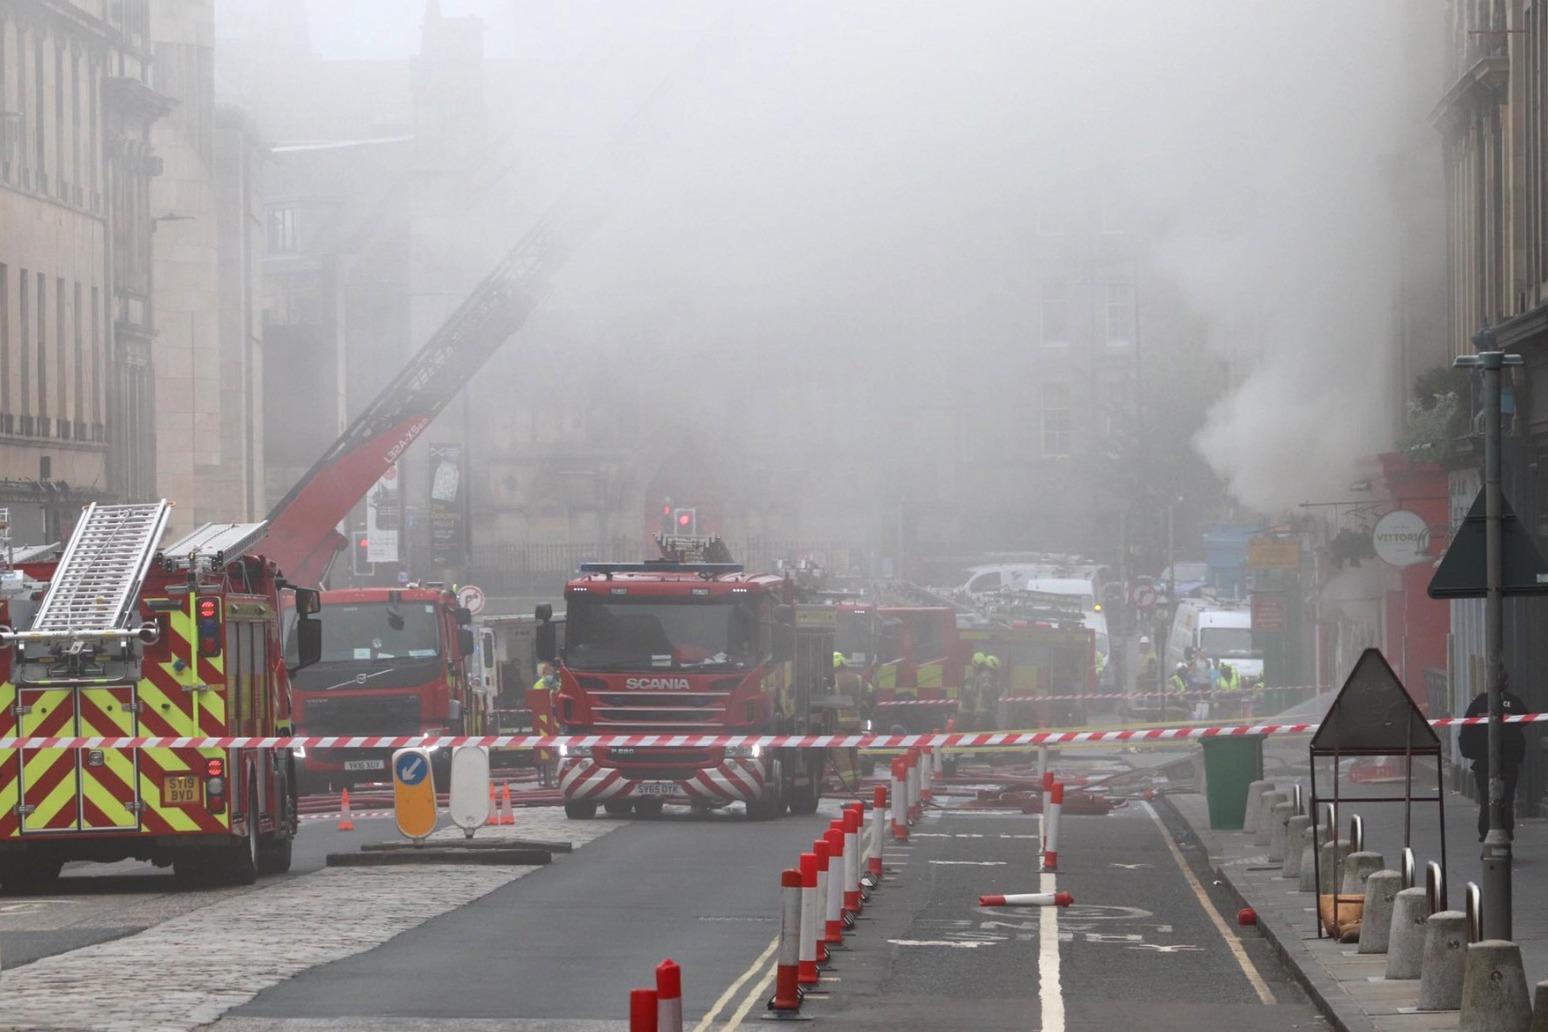 Fire crews tackle large fire in Edinburgh